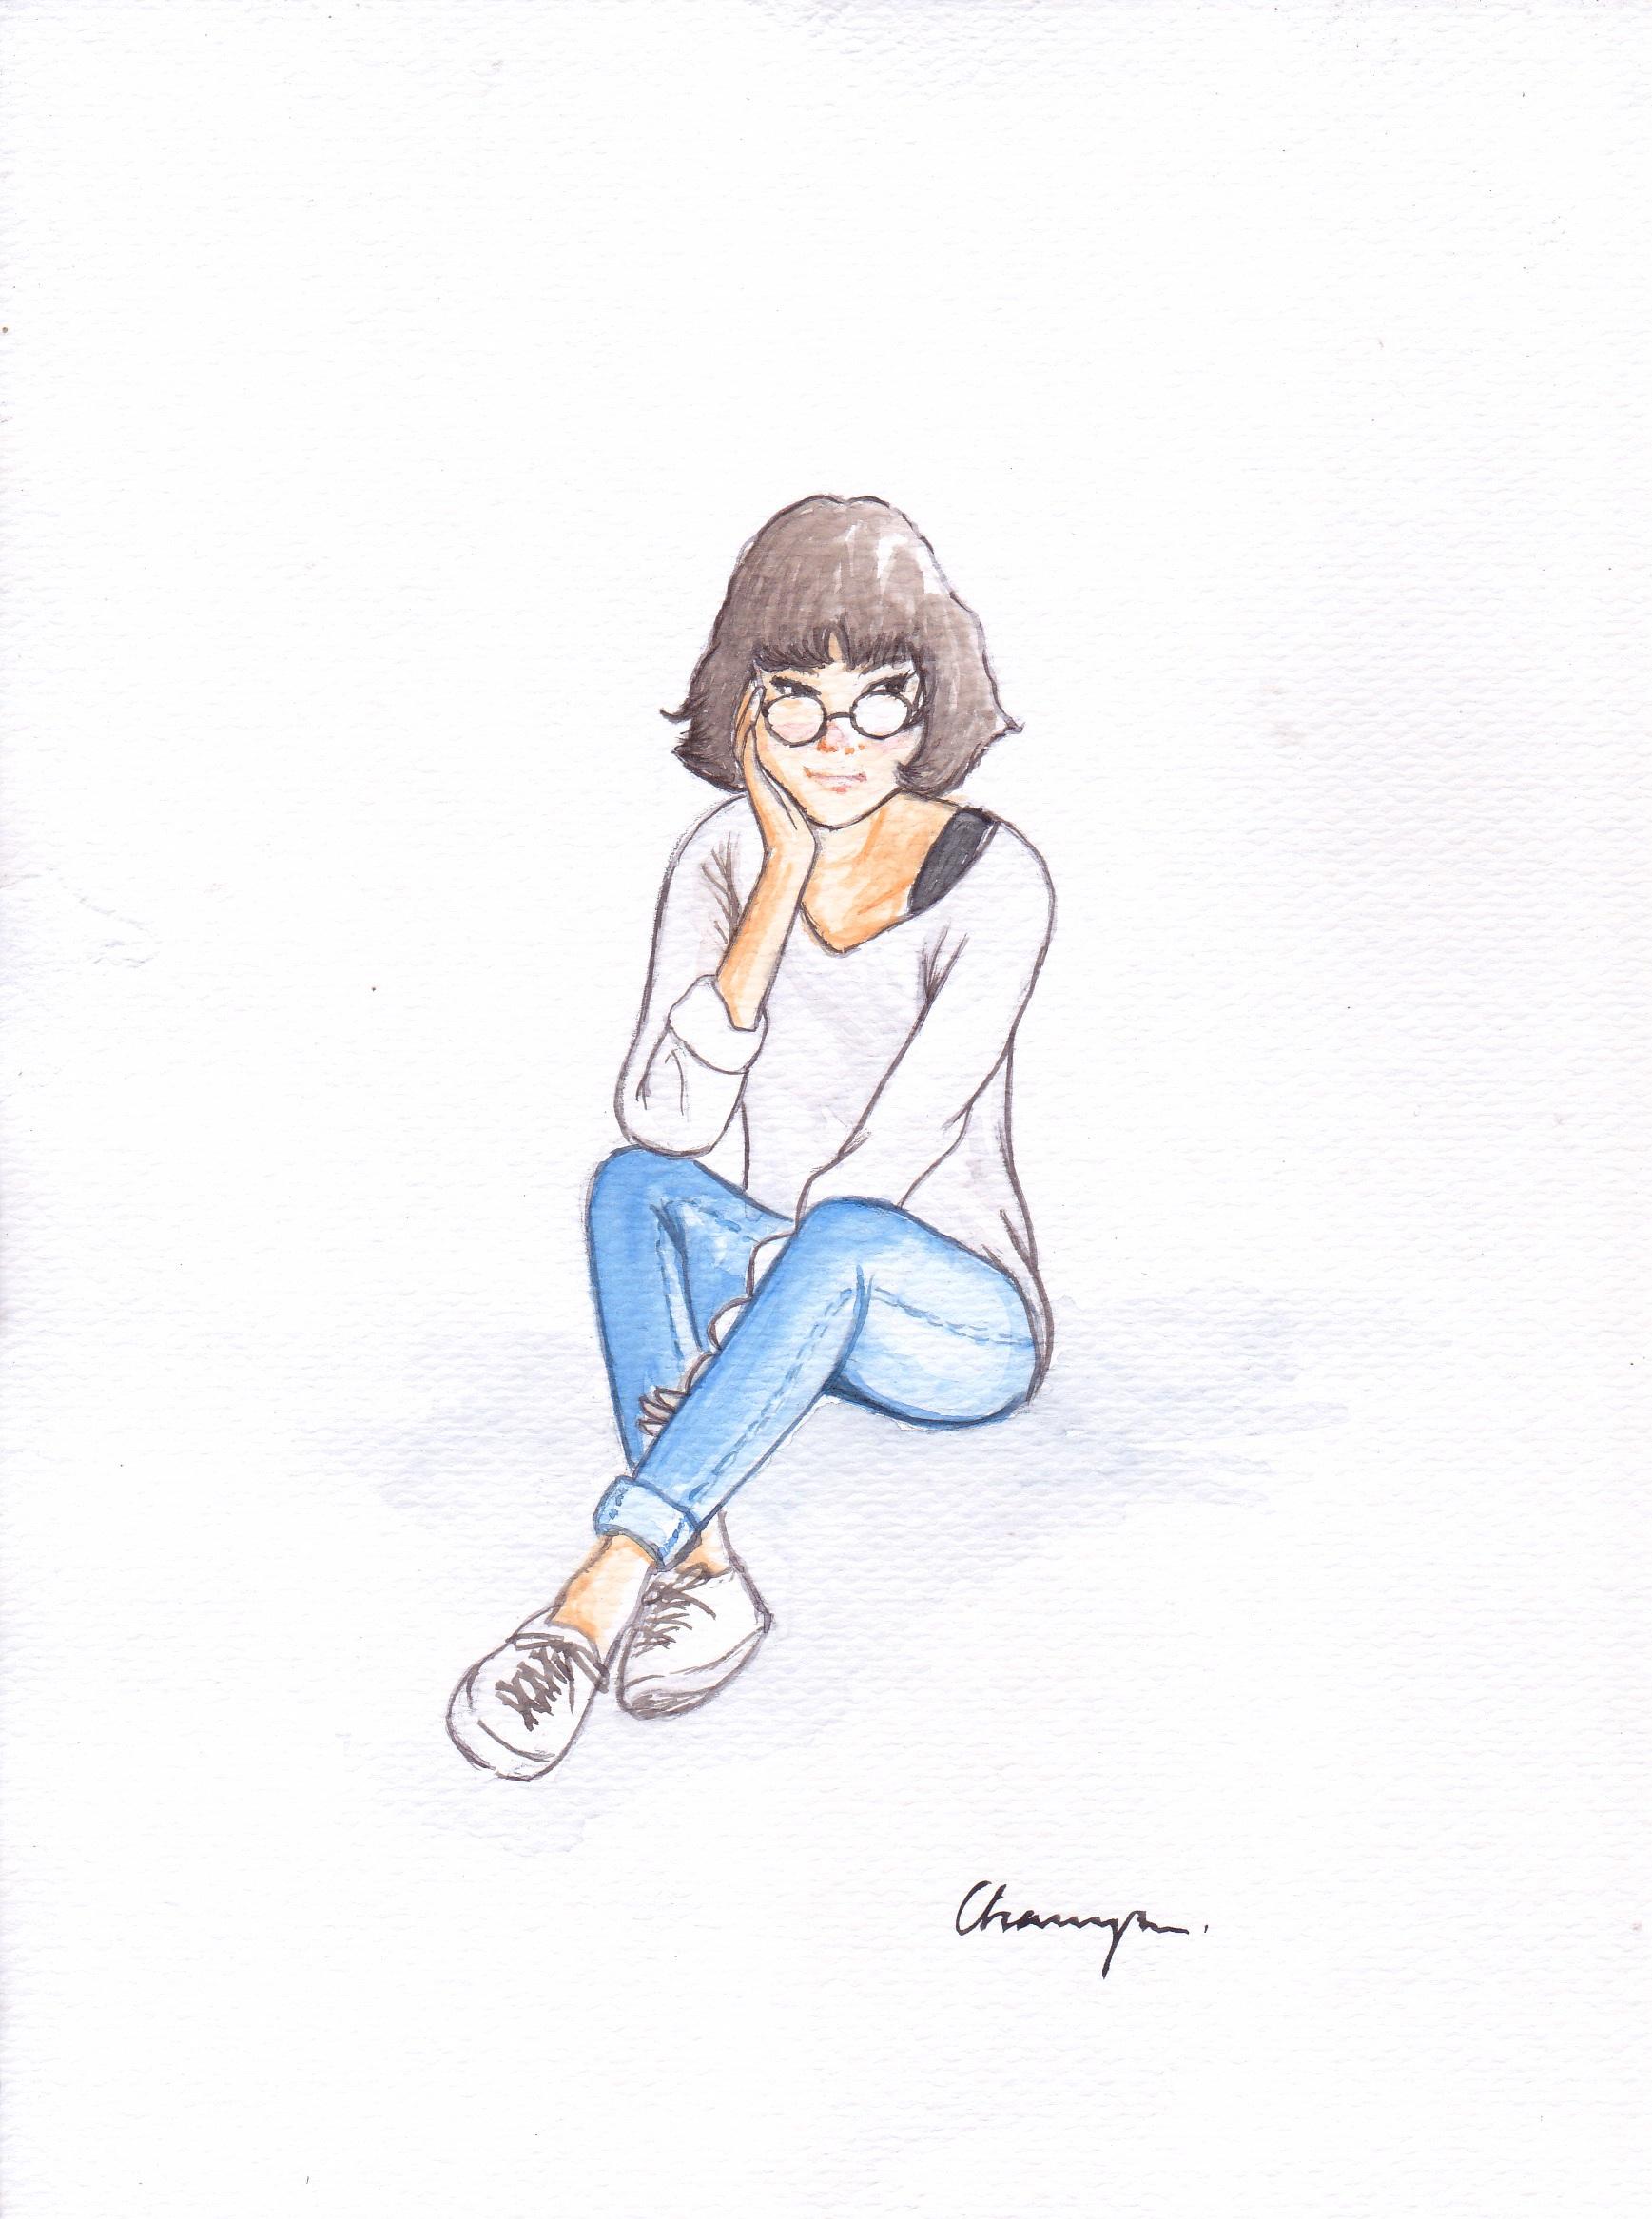 Download Gambar Sketsa Kartun Orang Nari Wanita